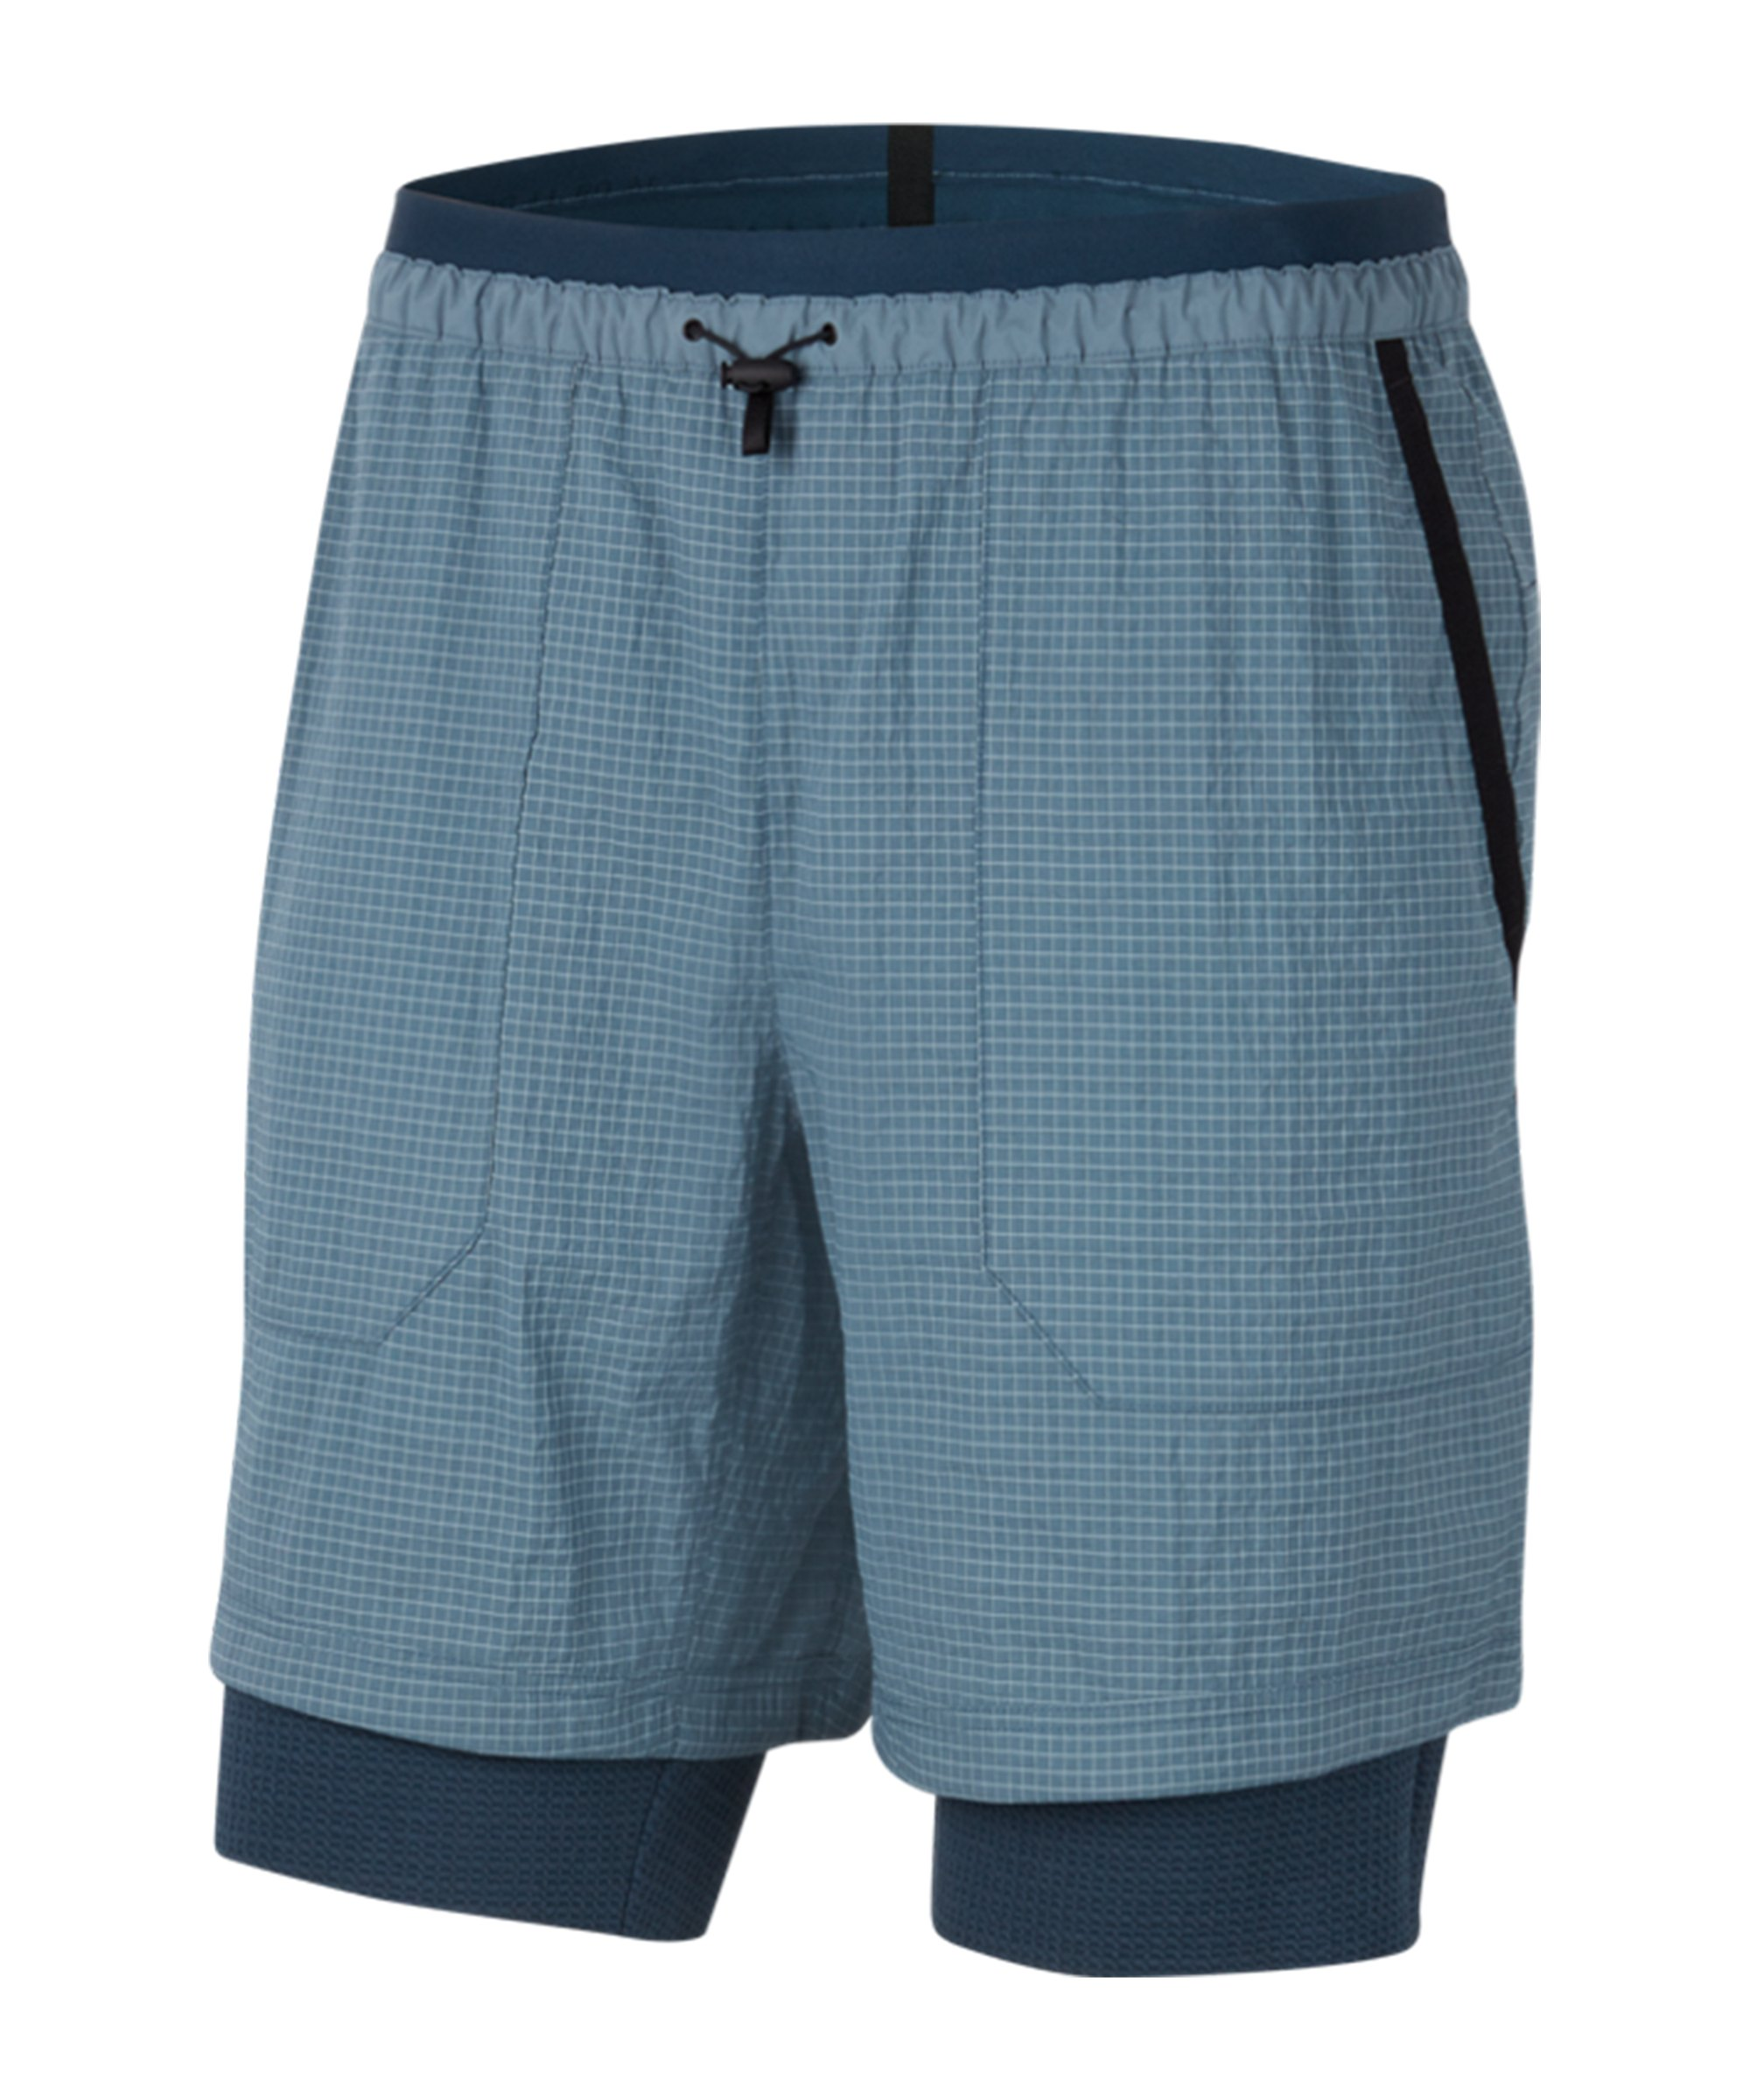 Nike Tech Pack Woven Short Blau F031 - blau